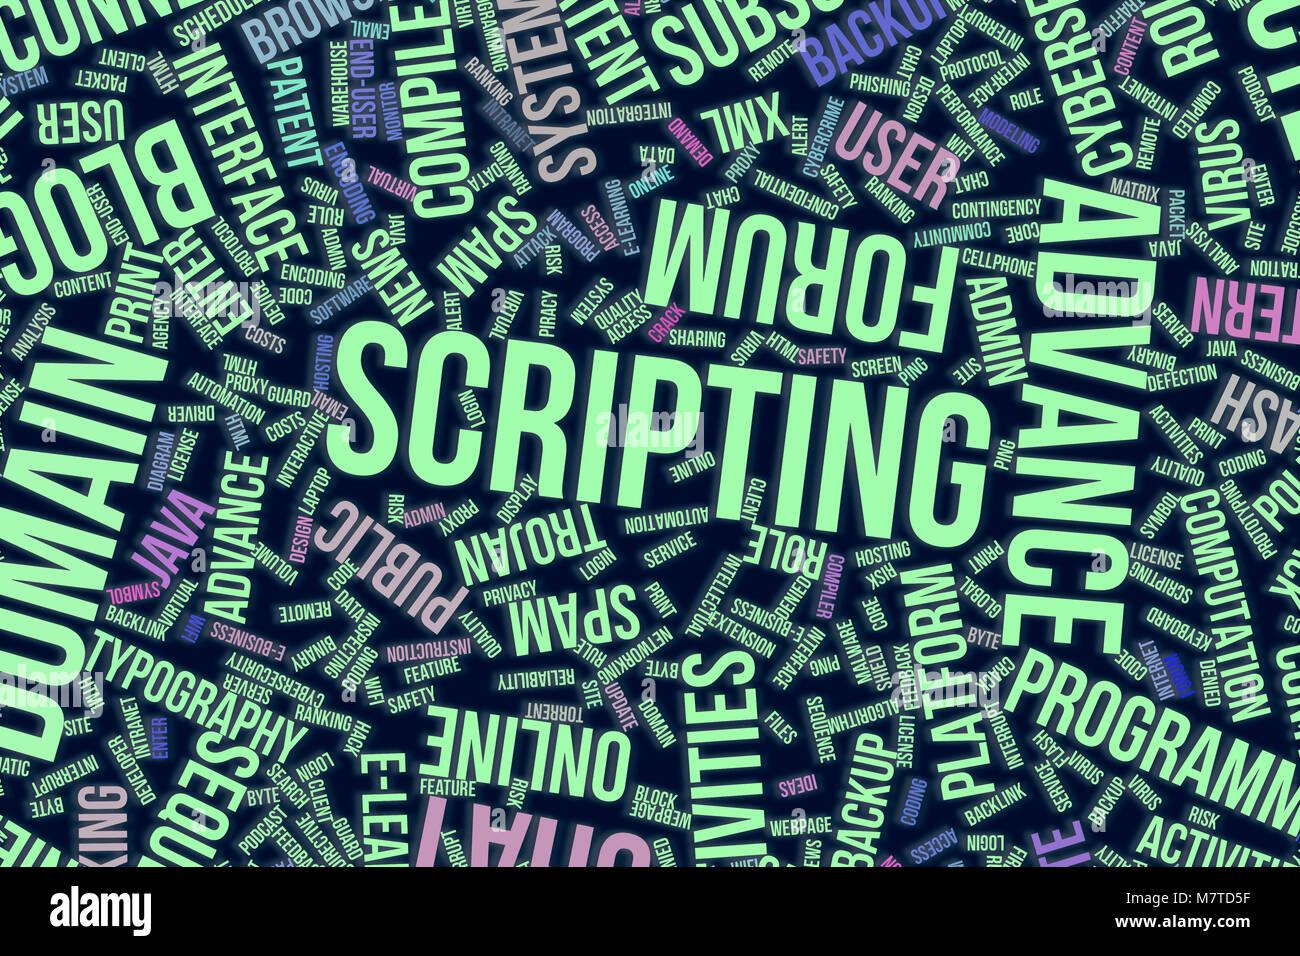 Scripting, IT, information technology conceptual word cloud